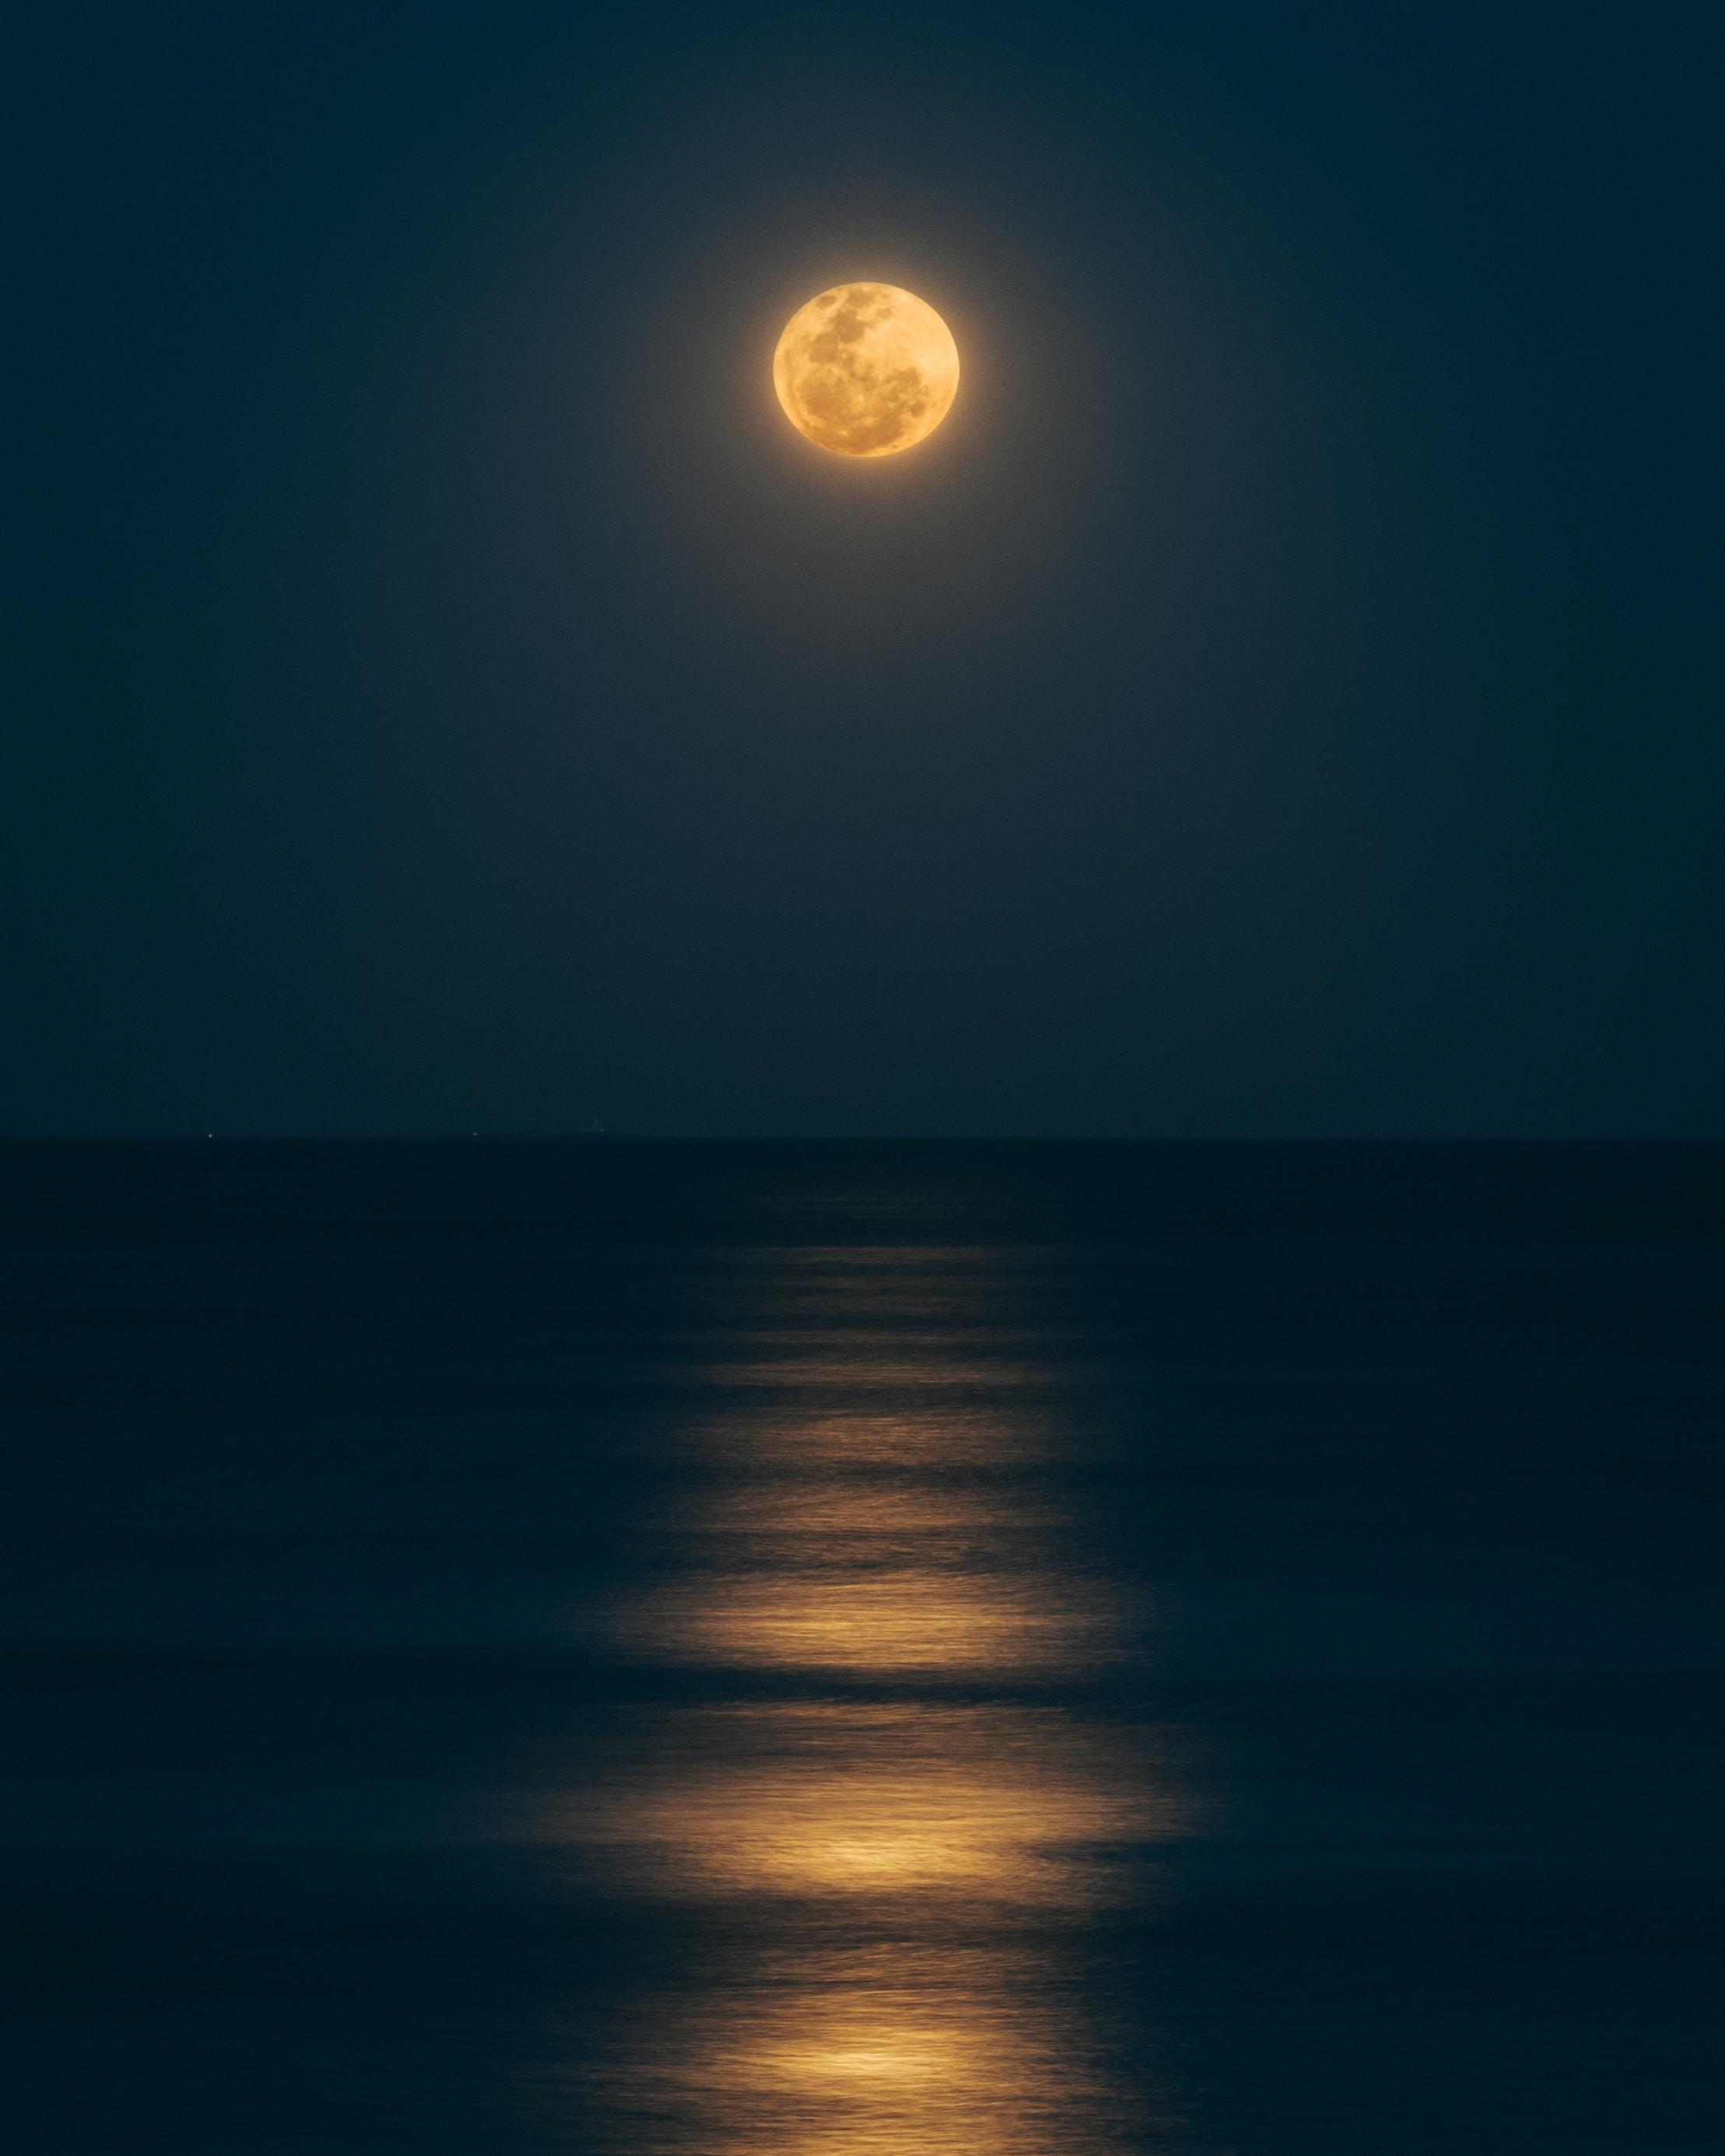 sea under full moon